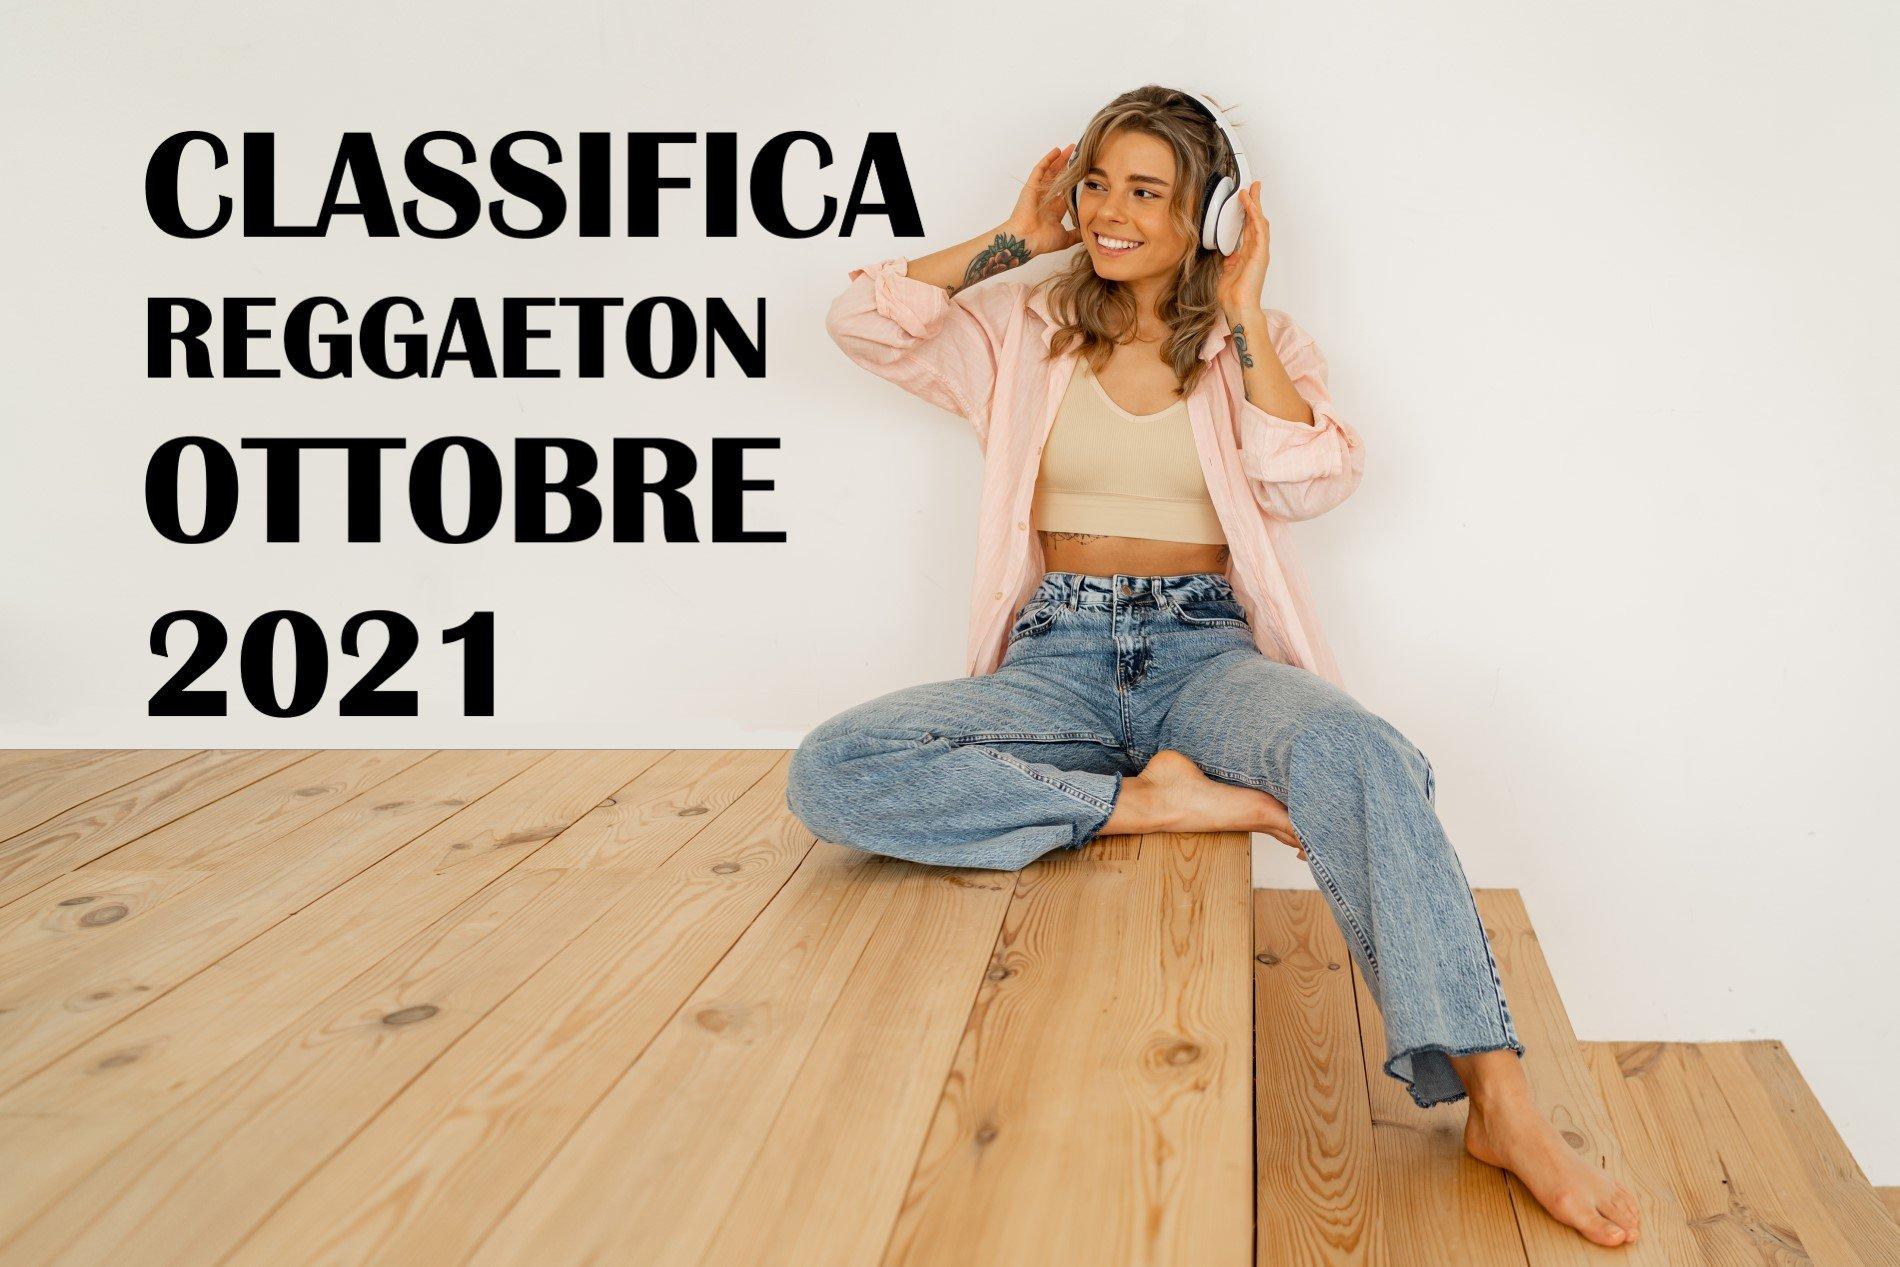 CLASSIFICA REGGAETON OTTOBRE 2021 - LA MEJOR MÚSICA OCTUBRE 2021 REGGAETON